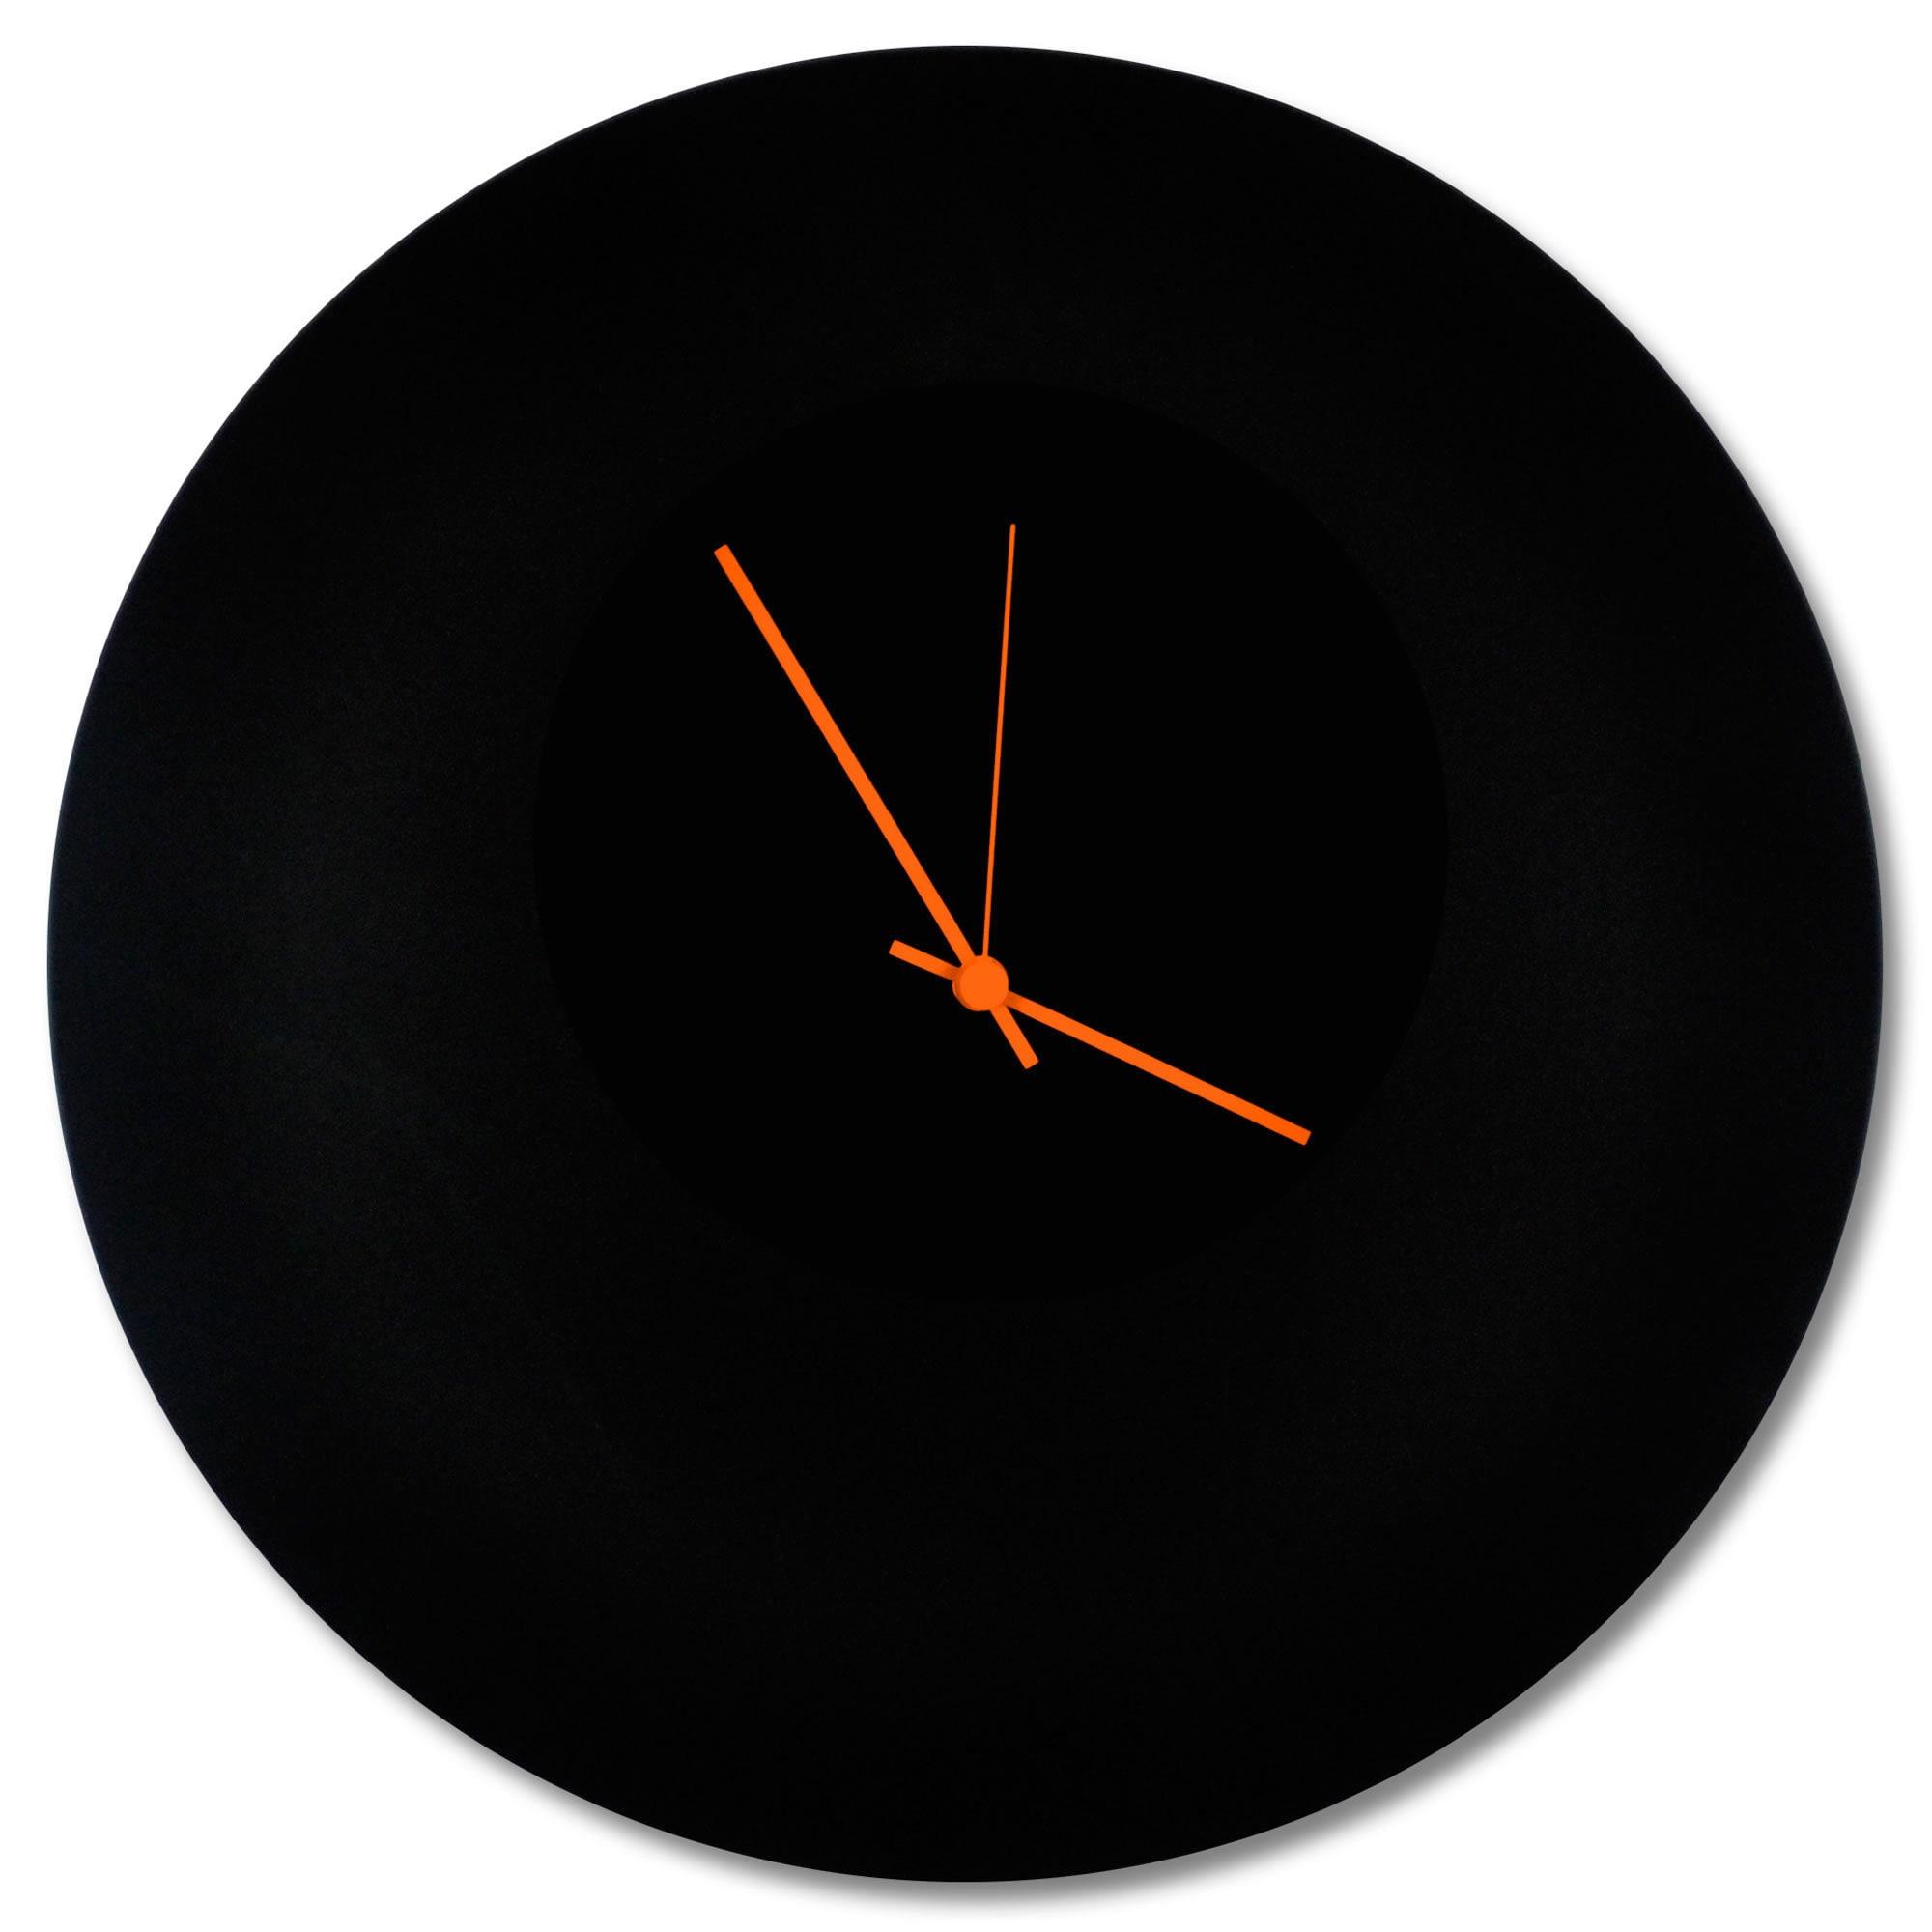 Shop Adam Schwoeppe U0027Blackout Circle Clocku0027 Minimalist Modern Black Wall  Decor   On Sale   Free Shipping Today   Overstock.com   11901537